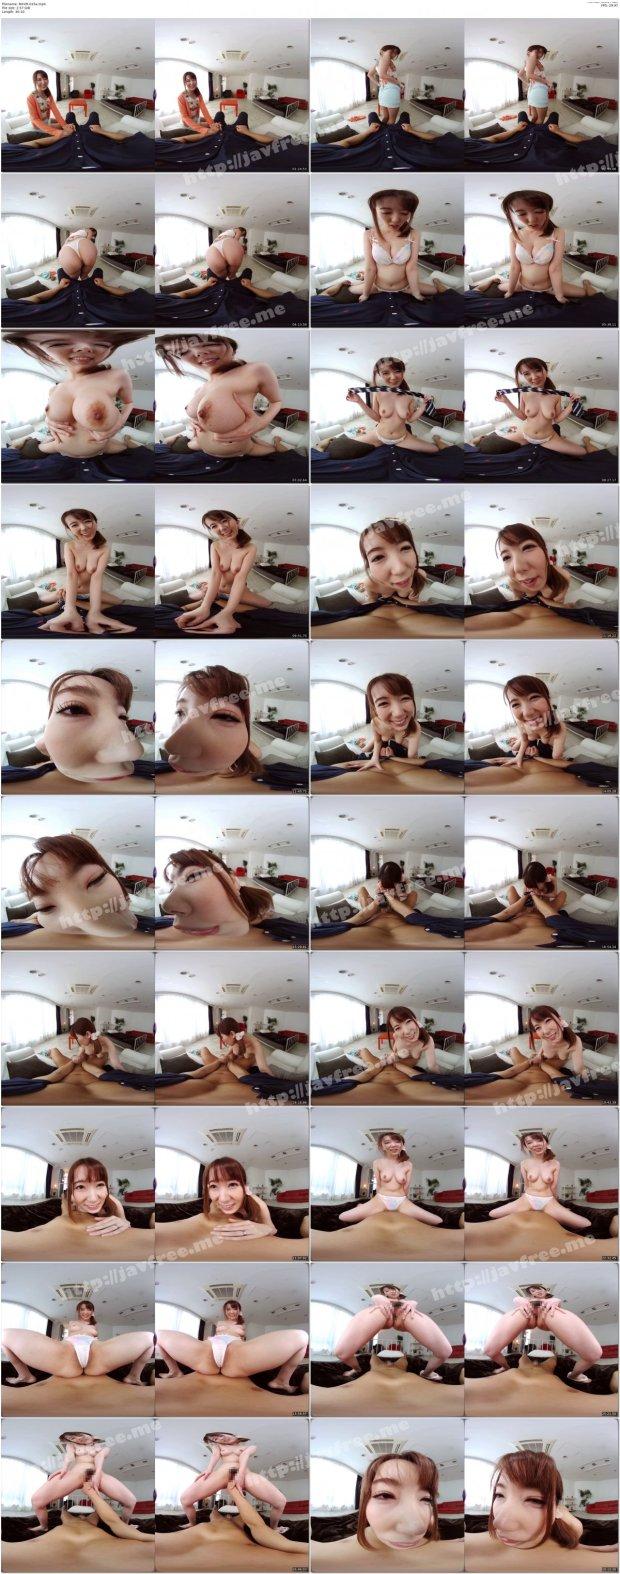 [MXVR-015] 【VR】夫婦のエッチで時たまビッチな淫乱嫁【波多野結衣】